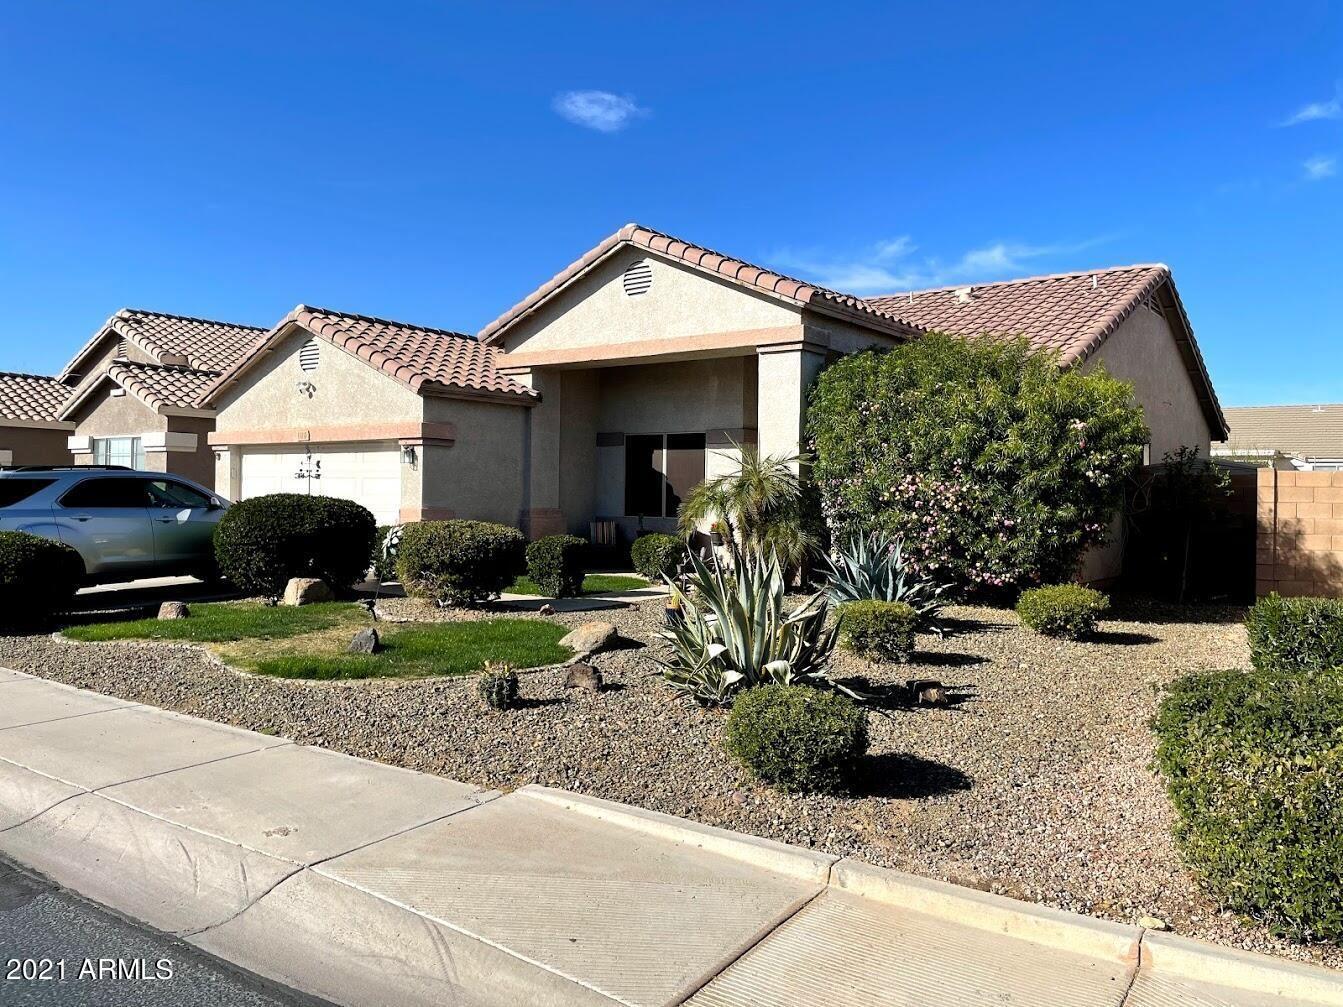 Photo of 13010 W Pershing Street, El Mirage, AZ 85335 (MLS # 6201446)